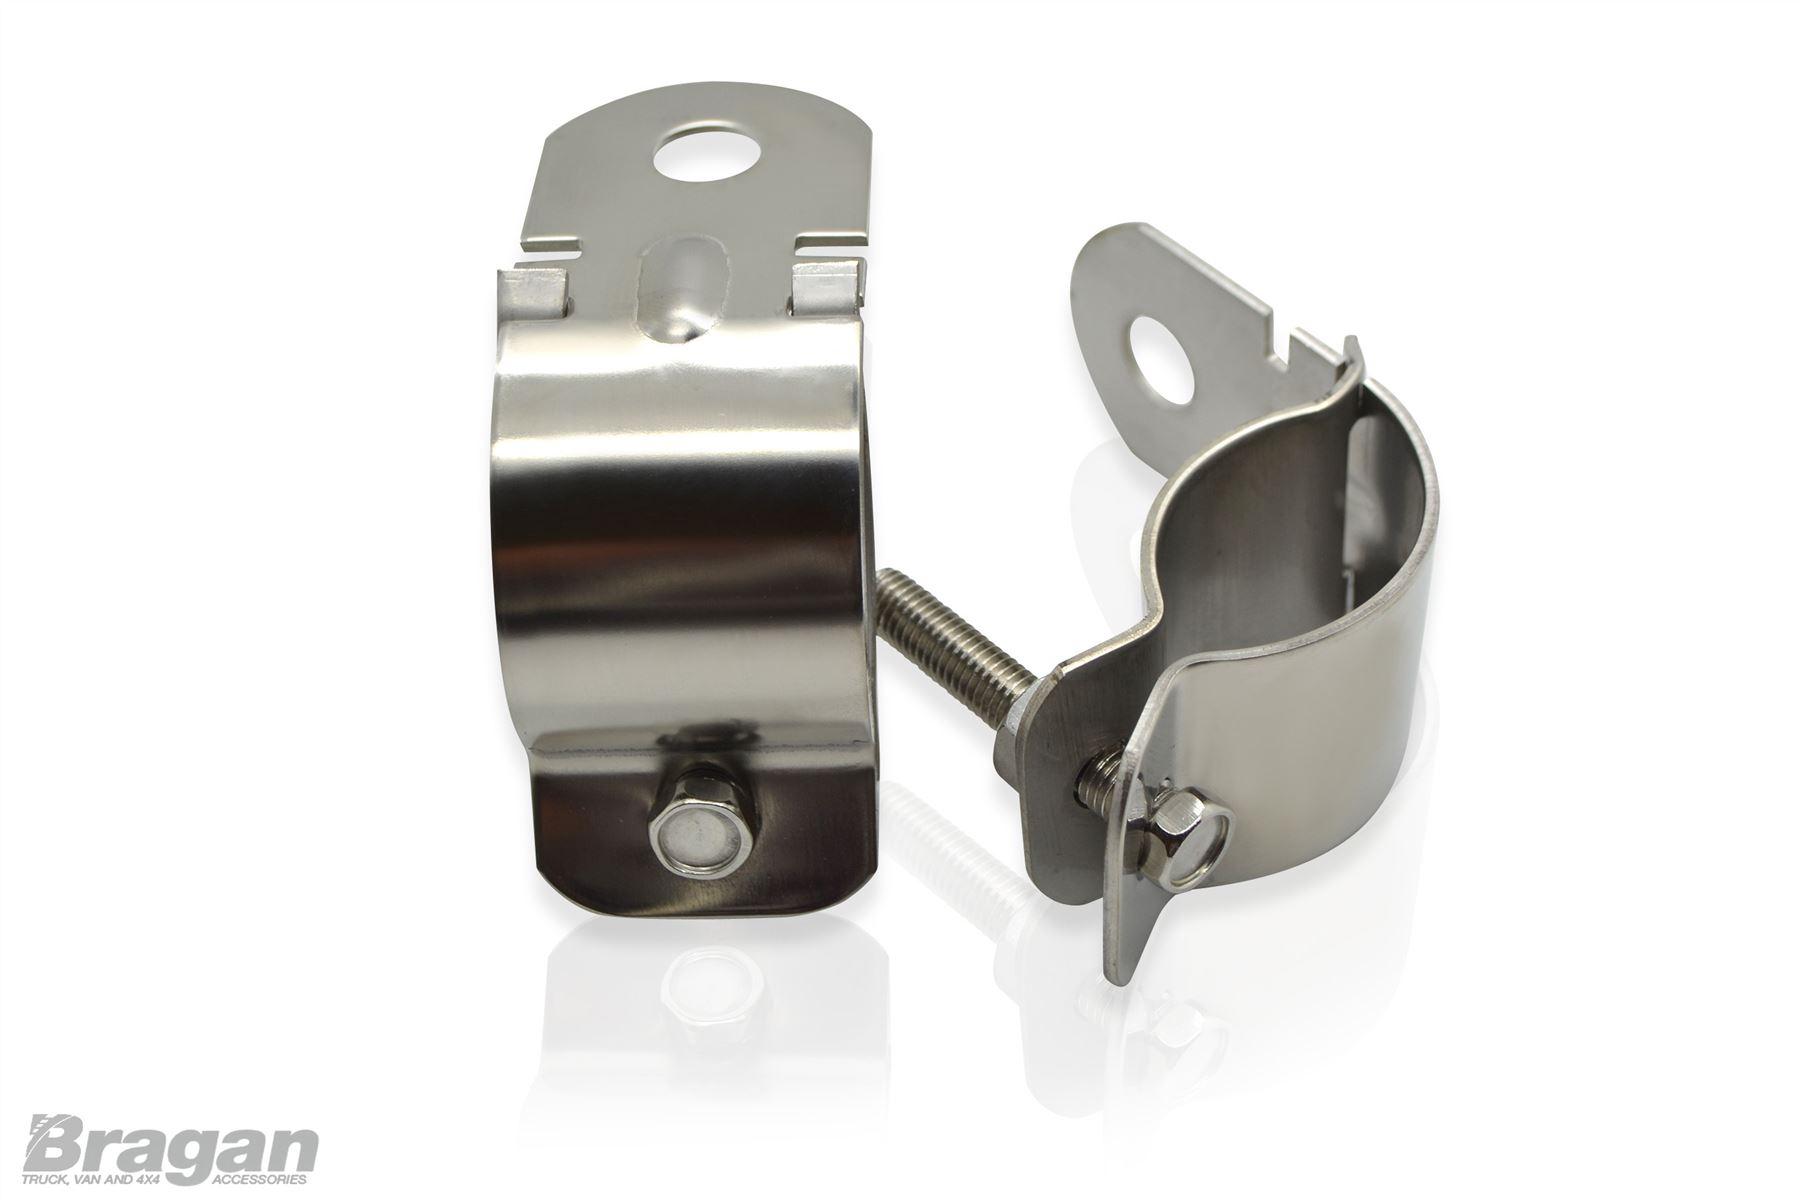 Abar bullbar bull nudge bar spot light brackets clamps